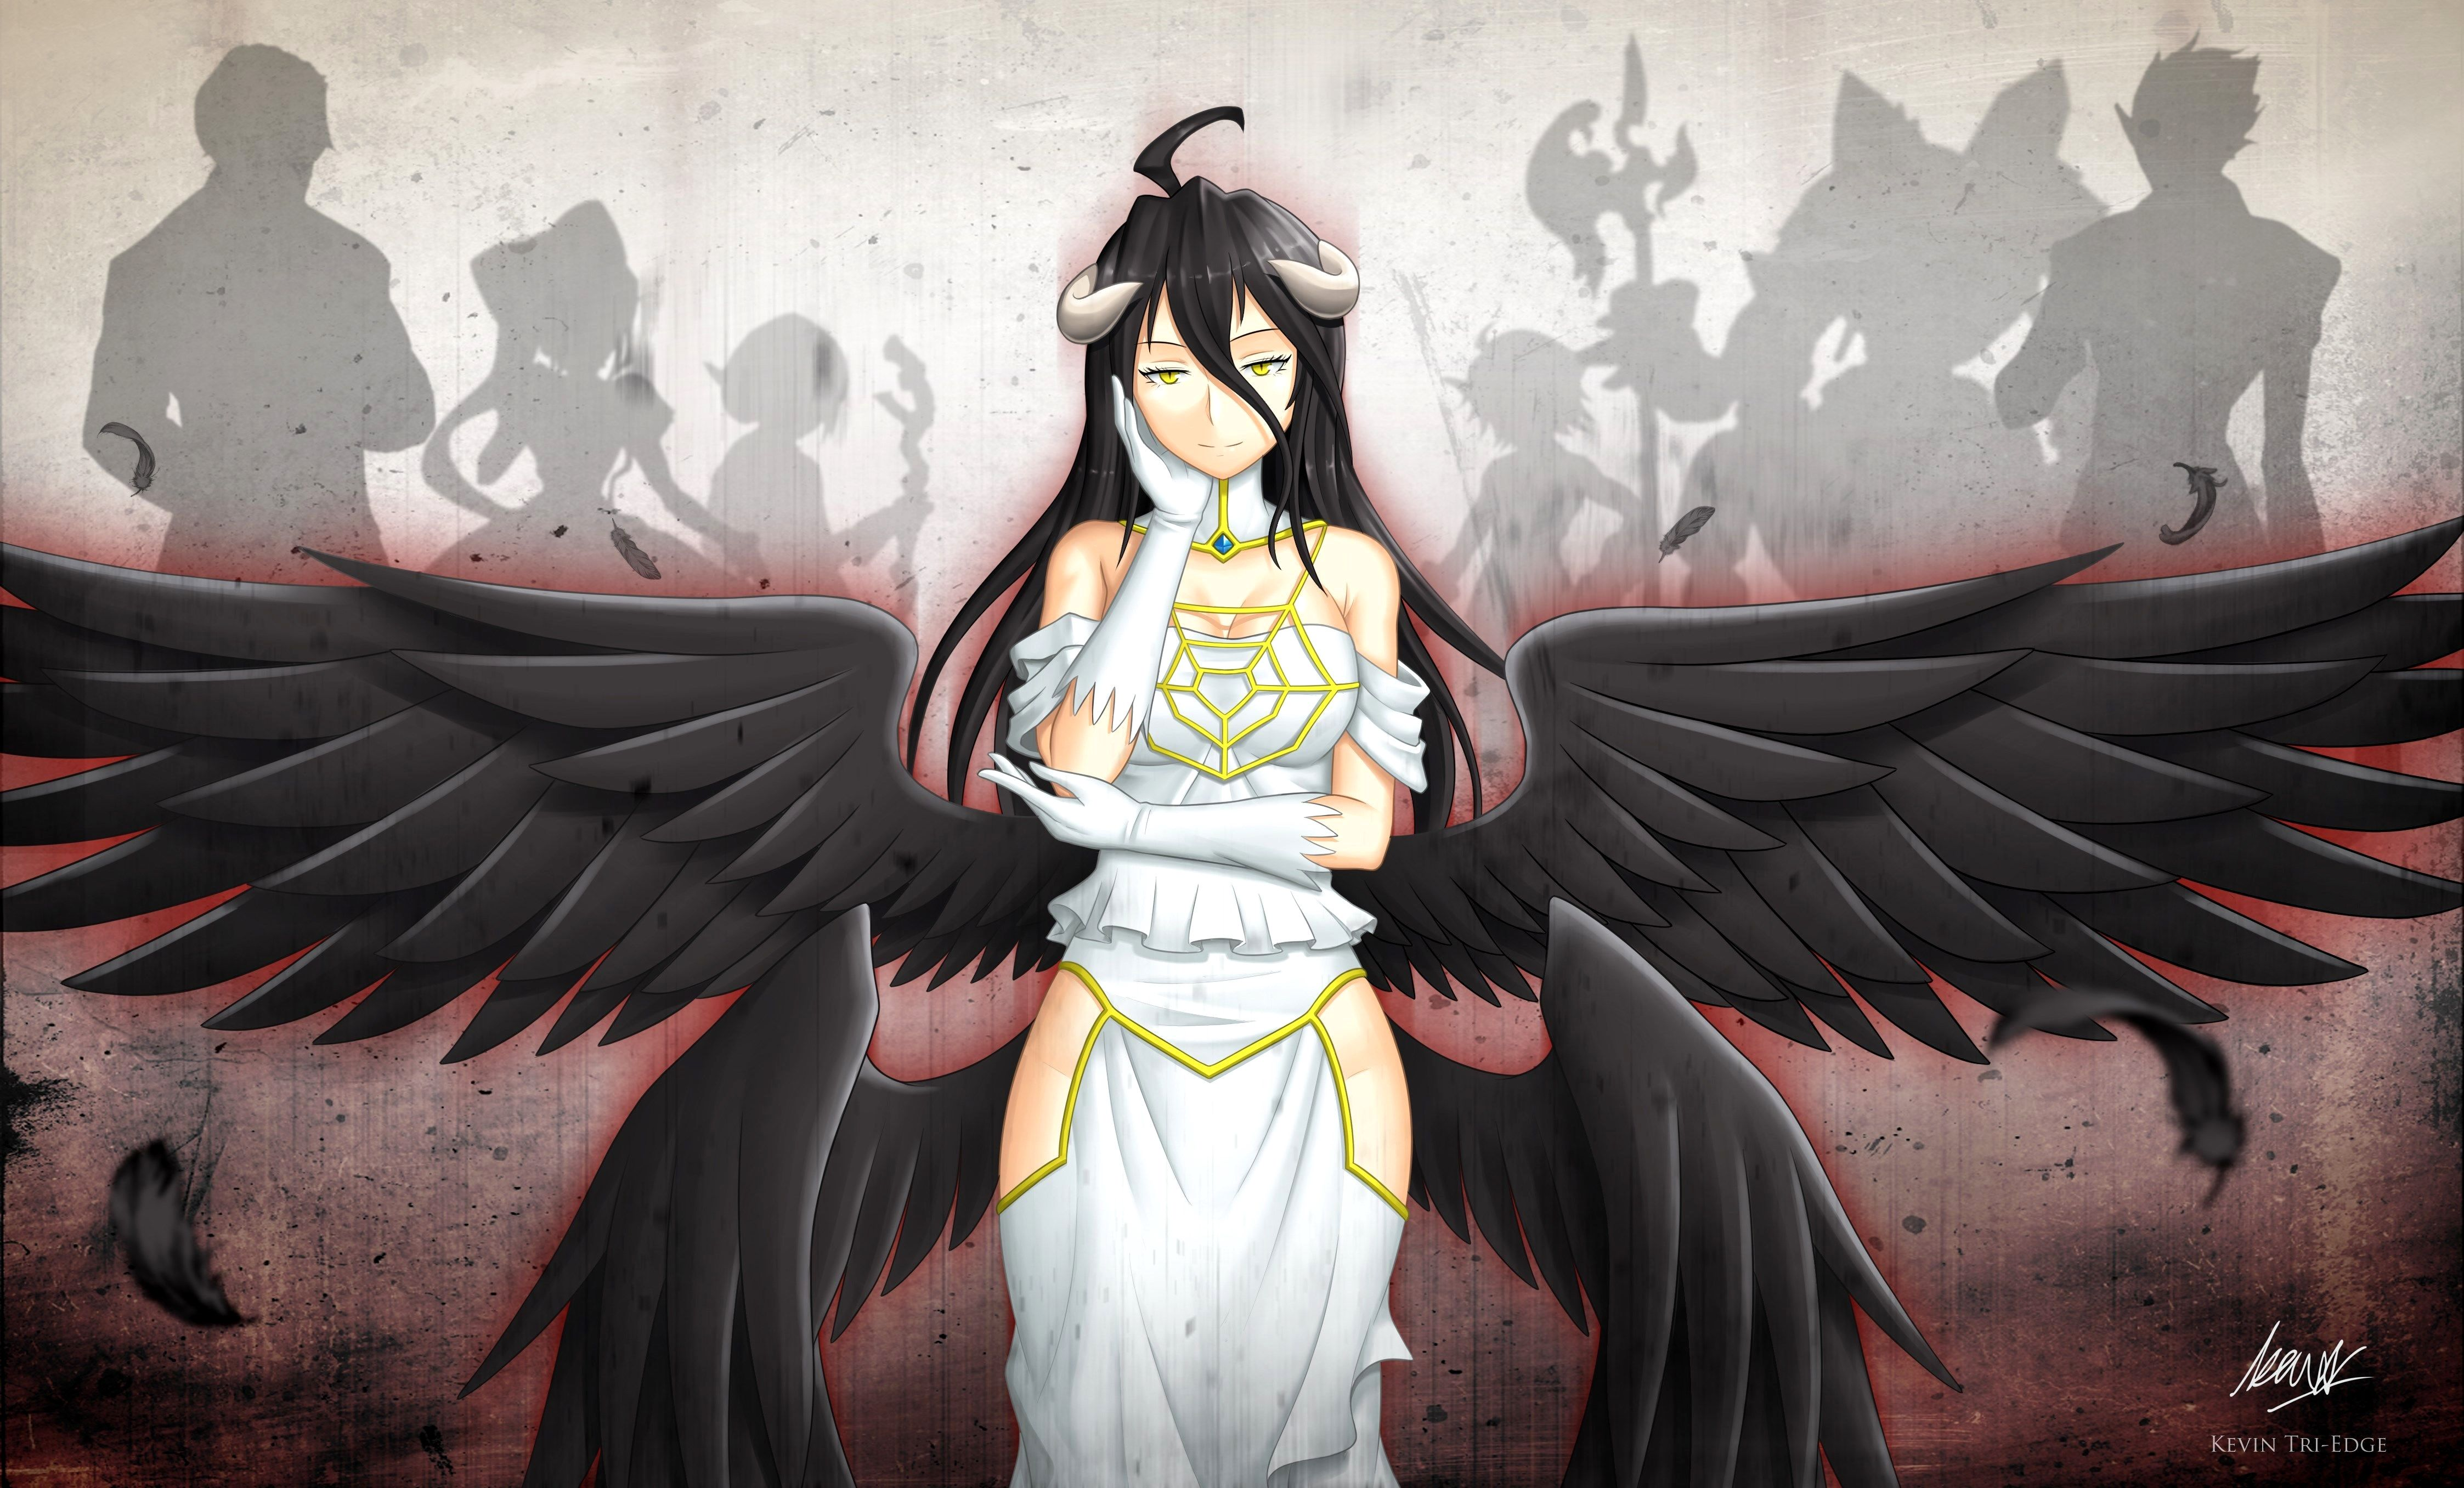 Wallpaper 4k Overlord Gallery In 2020 Anime Albedo Digital Wallpaper